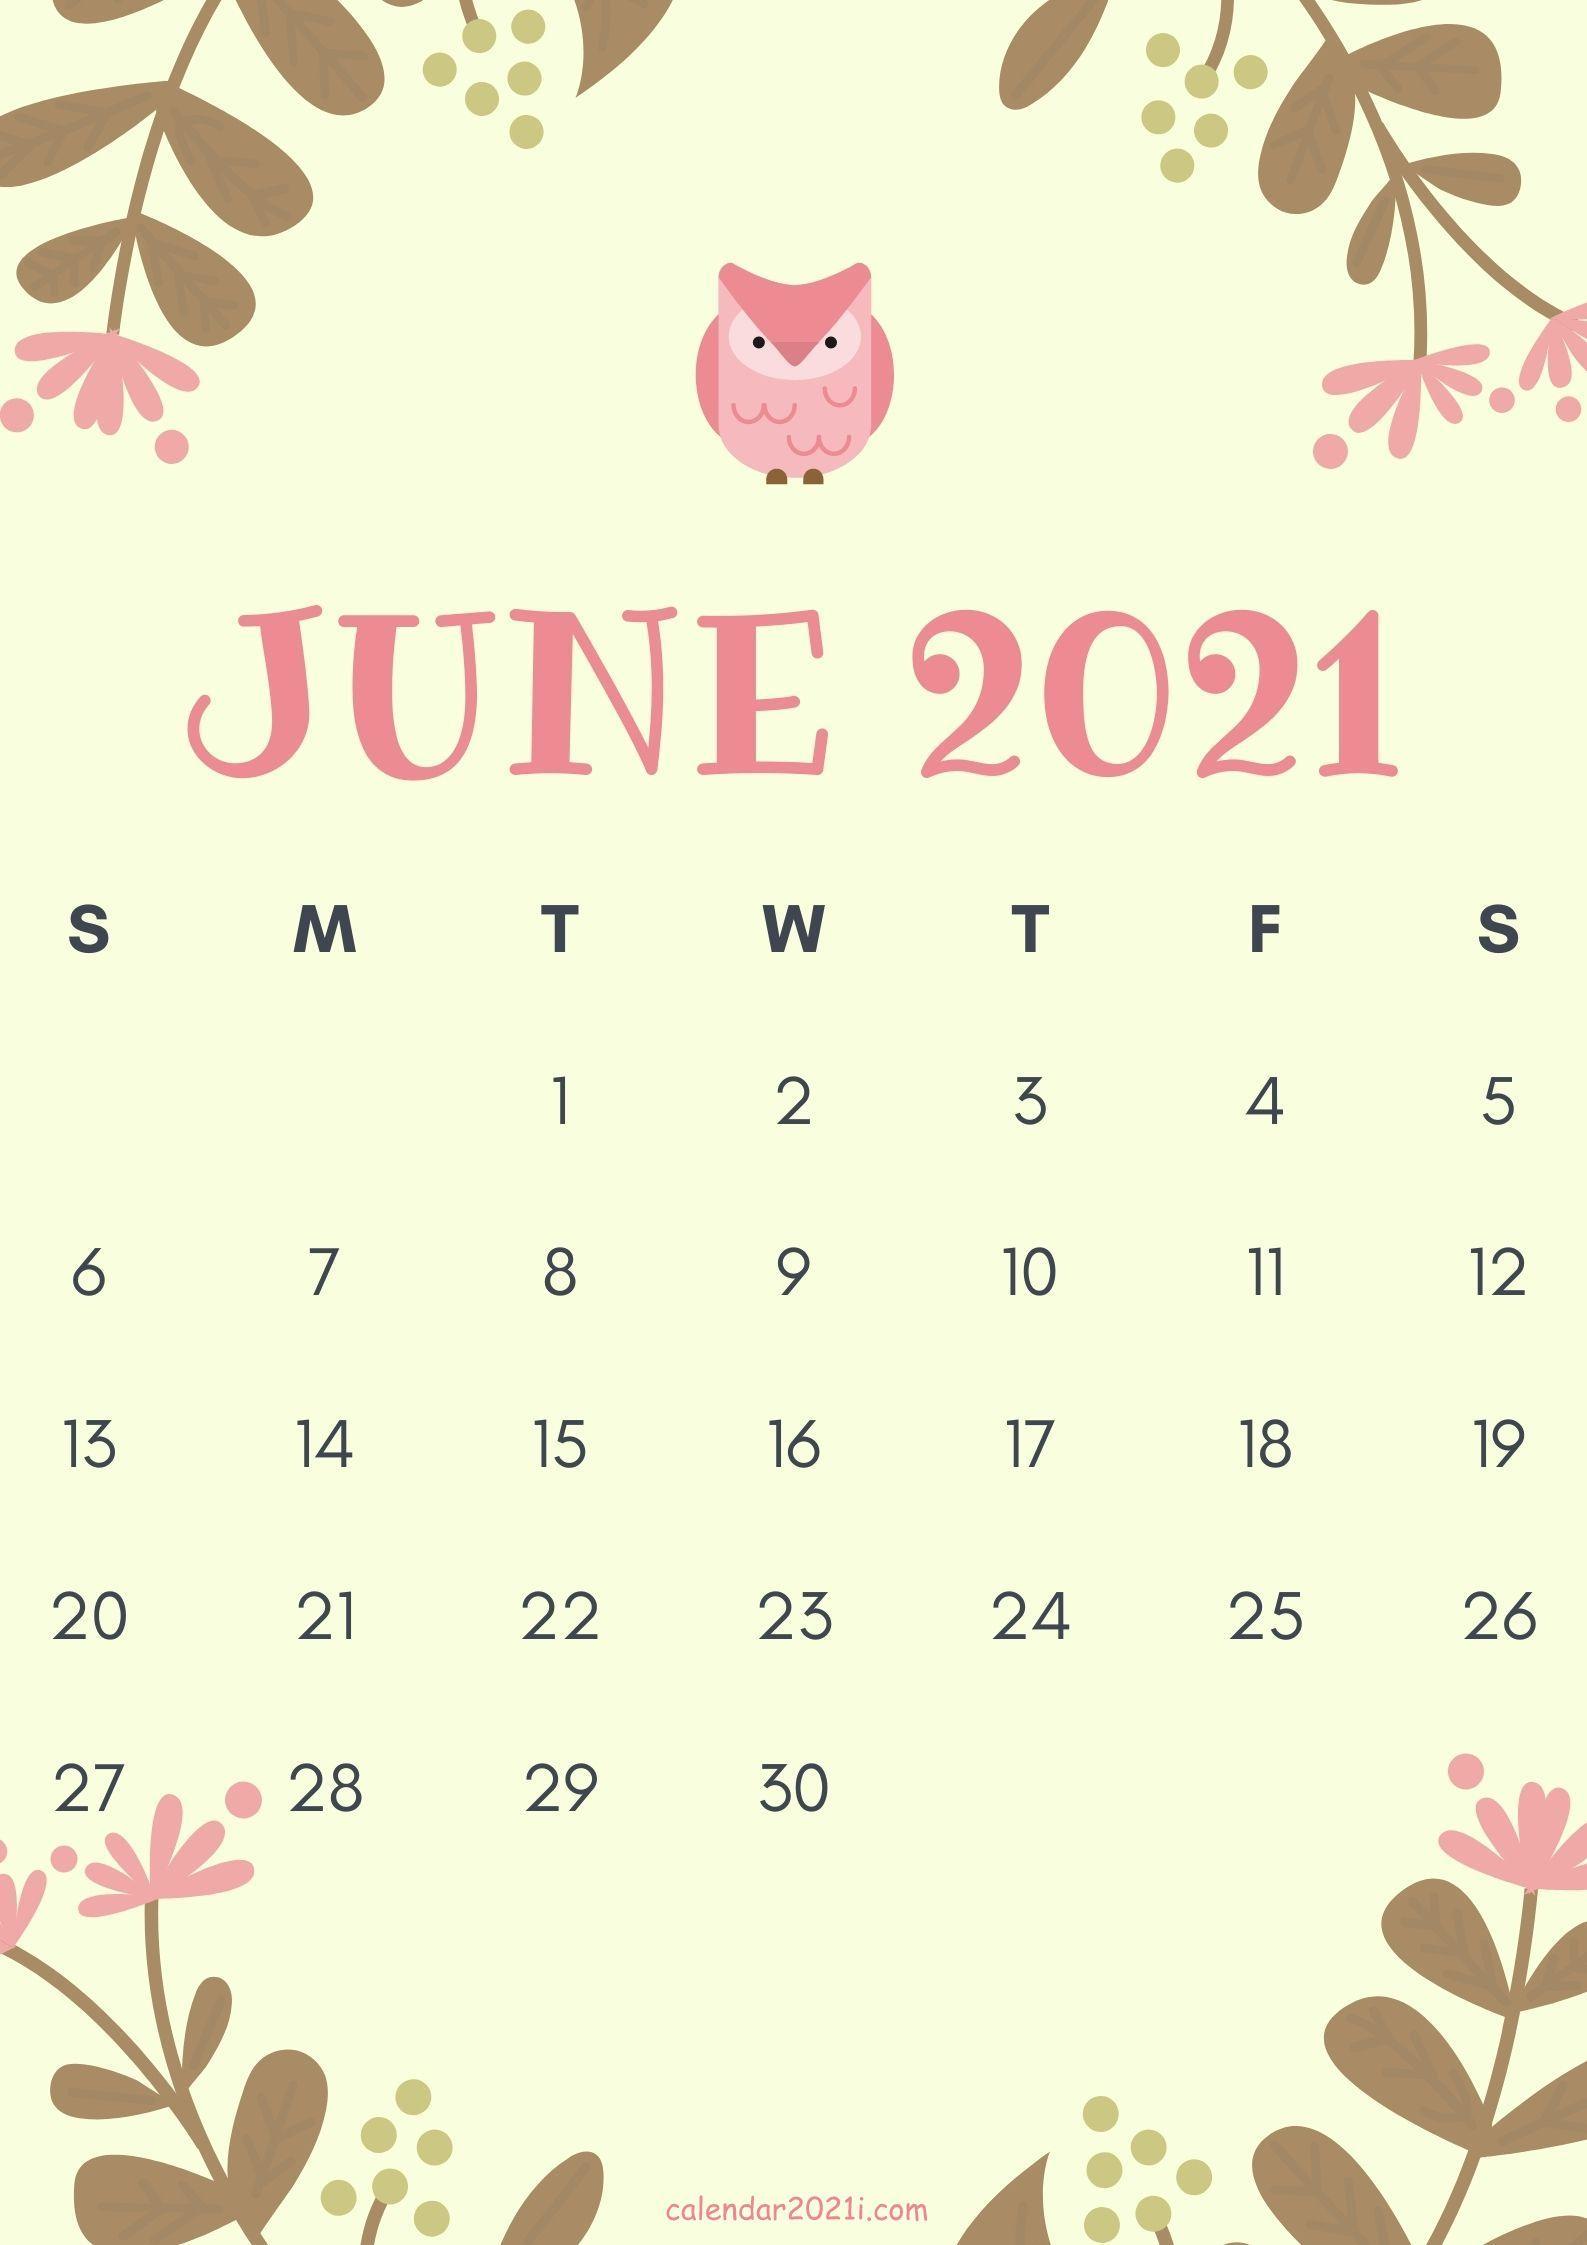 Cute June 2021 Calendar design theme layout free download